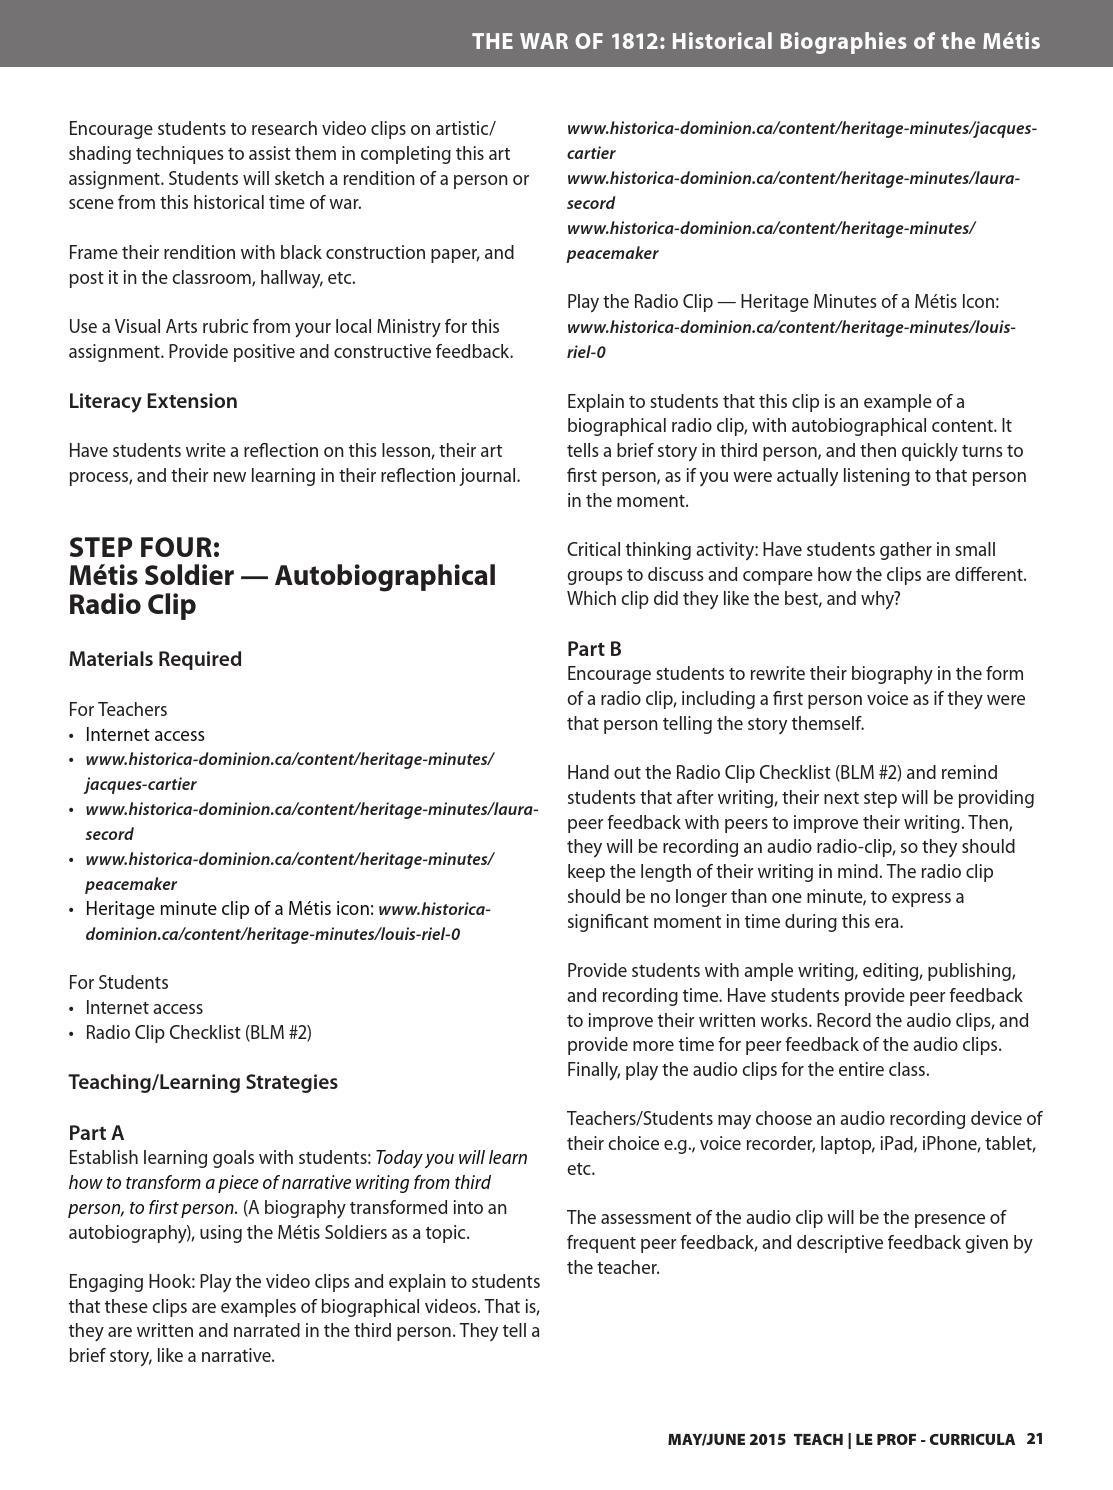 TEACH Magazine May/June 2015 by TEACH Magazine - issuu